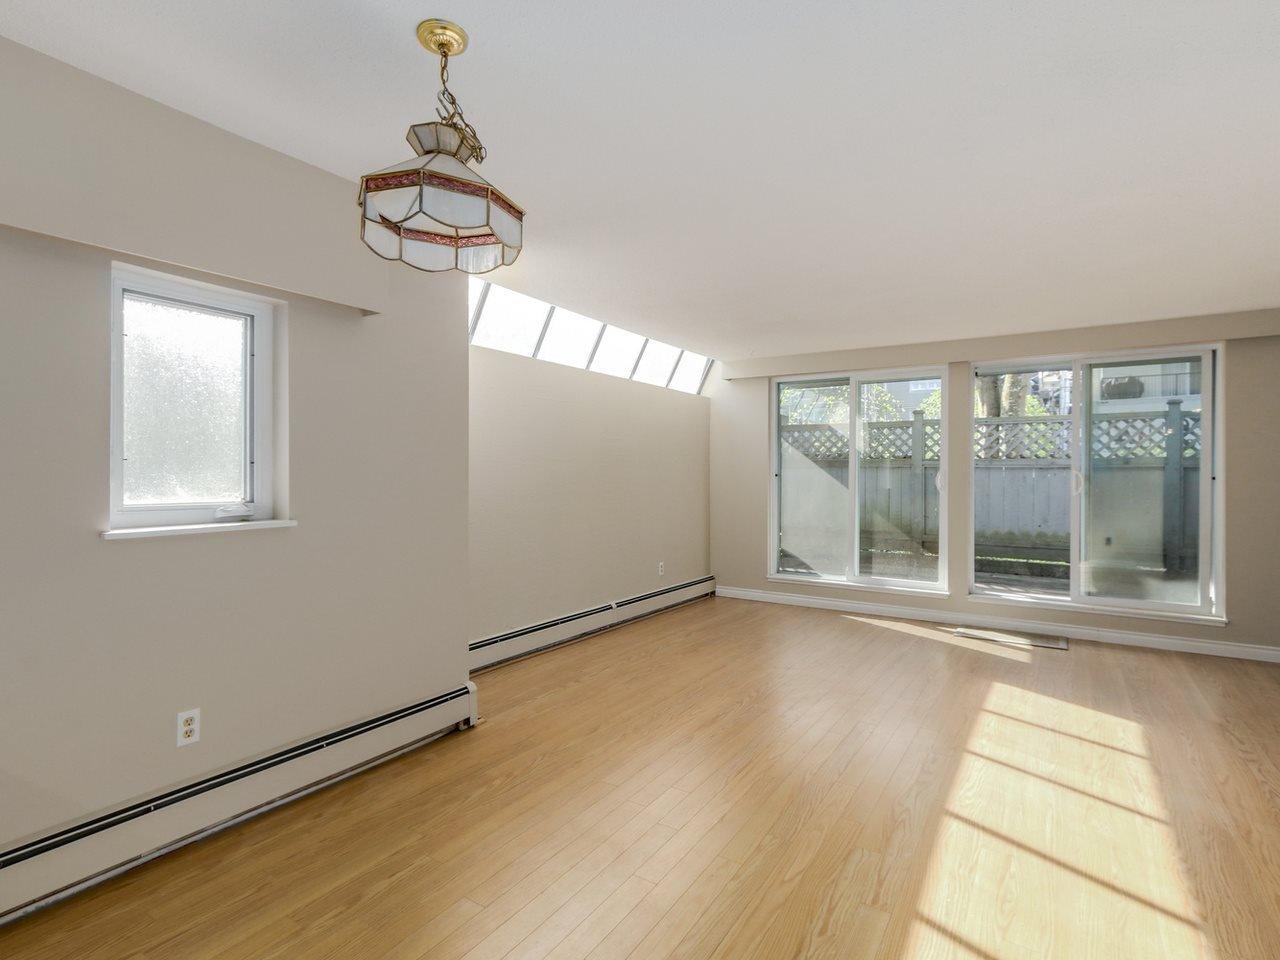 "Photo 4: Photos: 115 2125 YORK Avenue in Vancouver: Kitsilano Condo for sale in ""YORK GARDENS"" (Vancouver West)  : MLS®# R2054686"